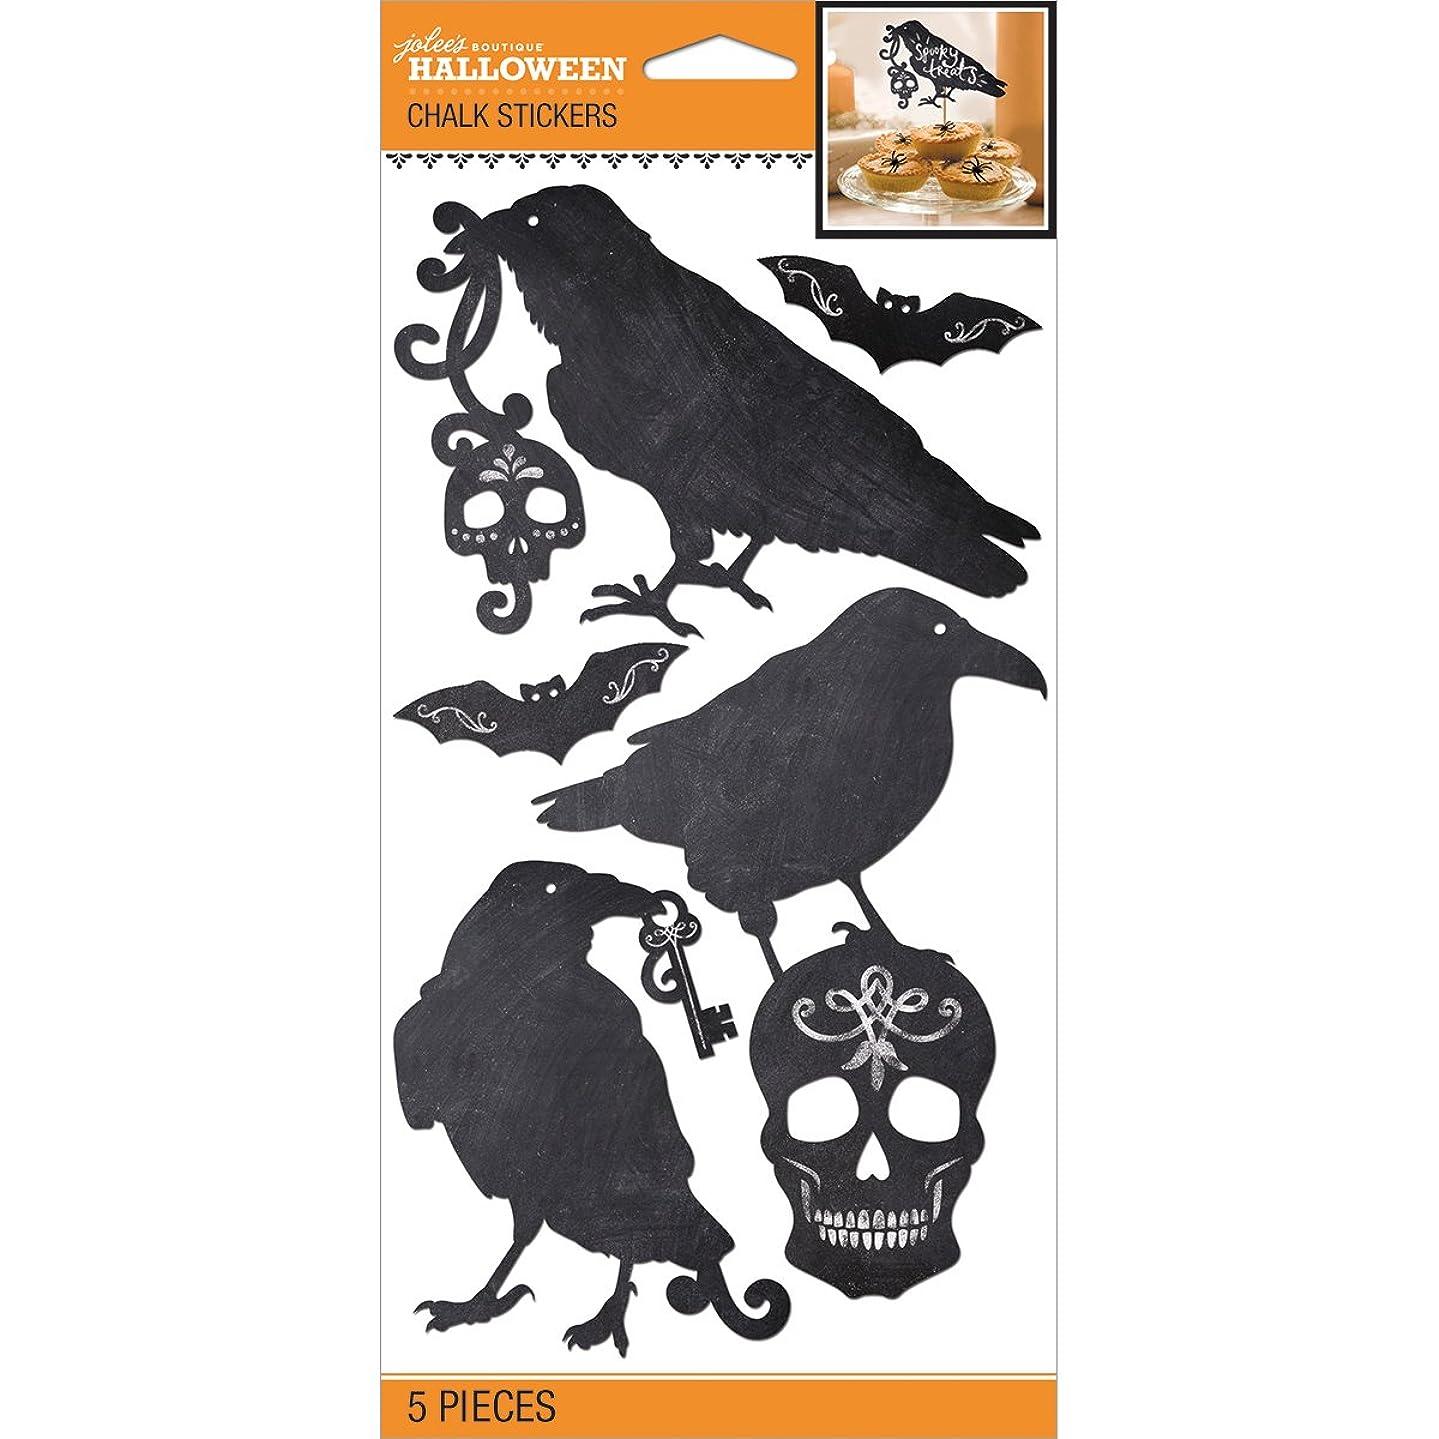 JOLEES Halloween Chalk Silhouette Stickers (5 Pack), Black/White